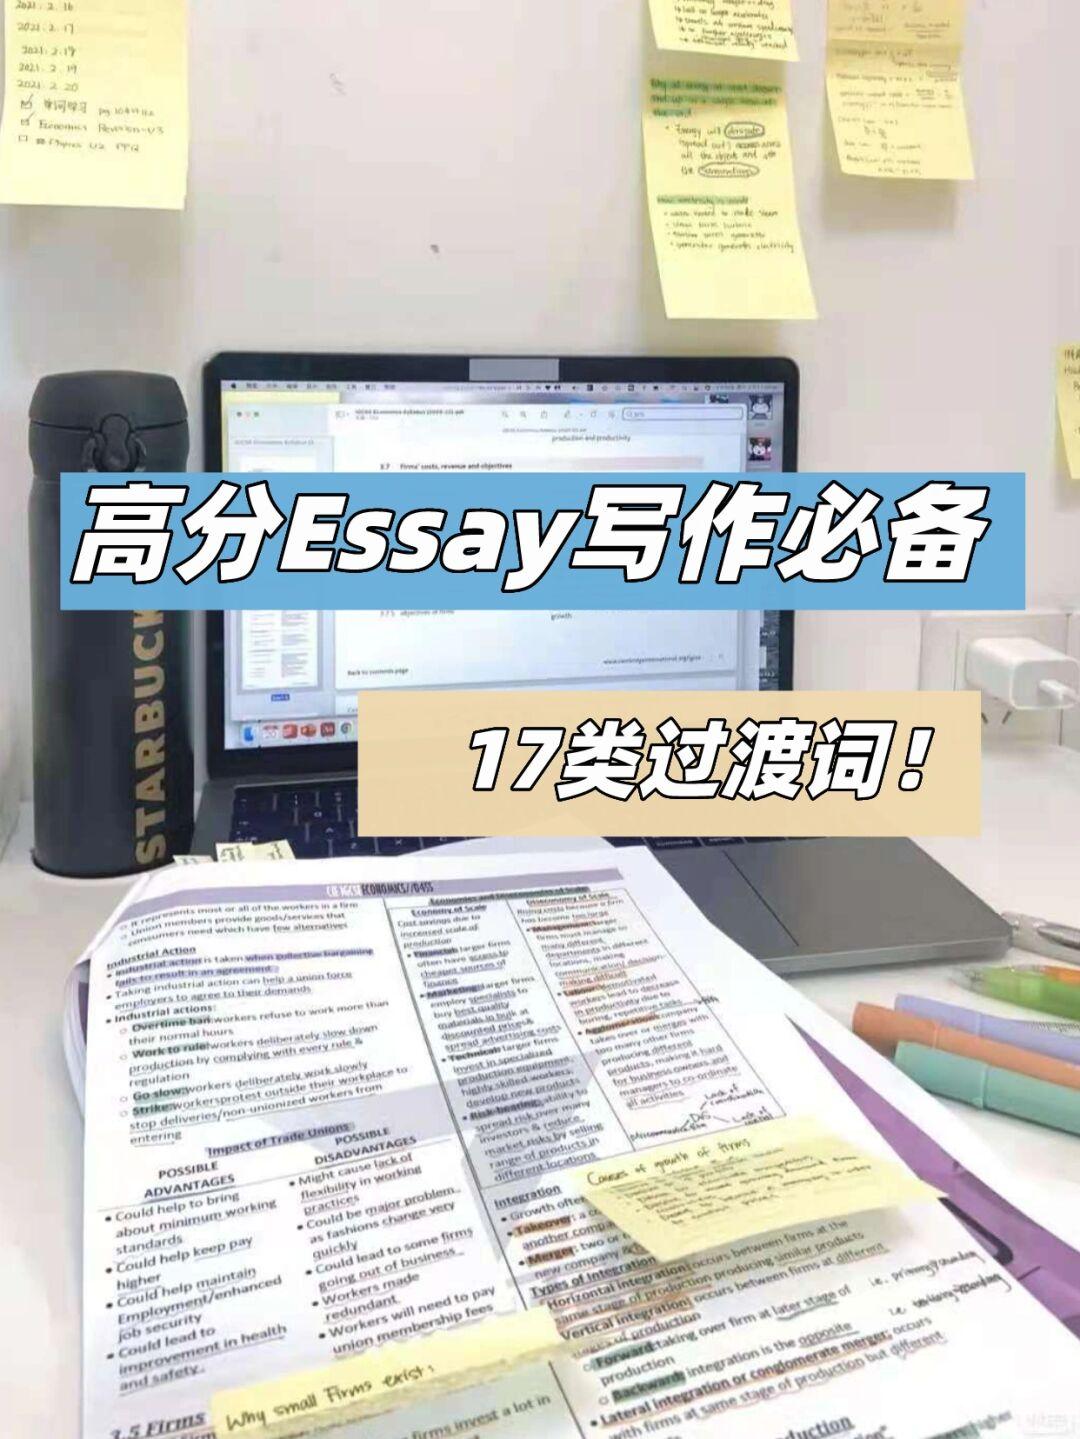 college essay代写 -高分essay写作必备 – 17类过渡词